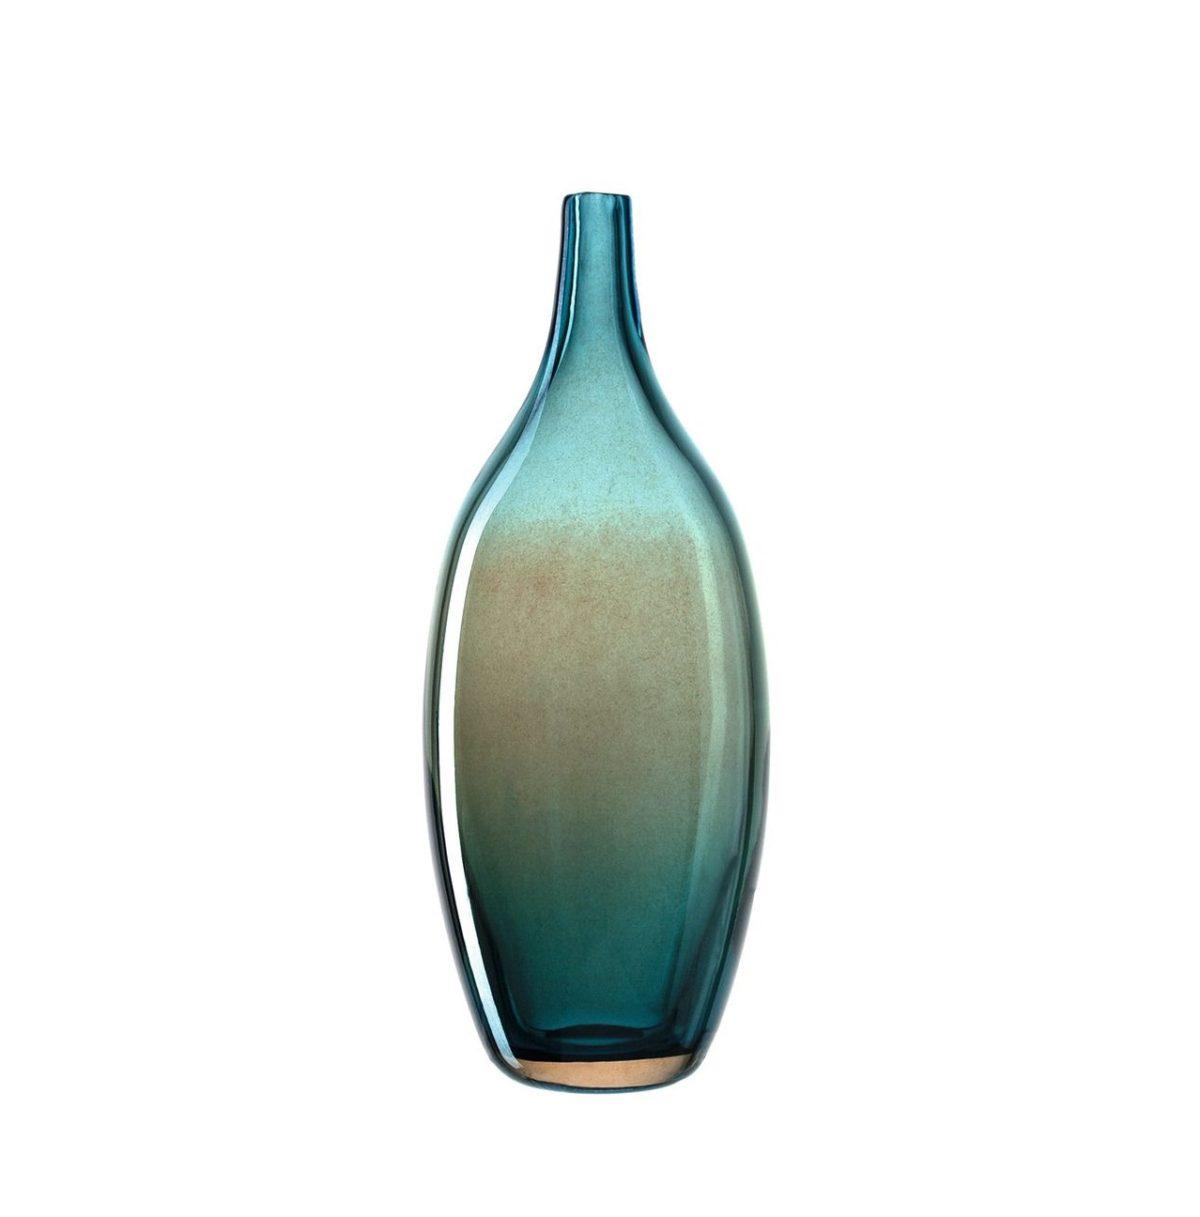 020815 0 k 1 1200x1217 - Vază luster Lucente turquoise 32 cm (L020815)